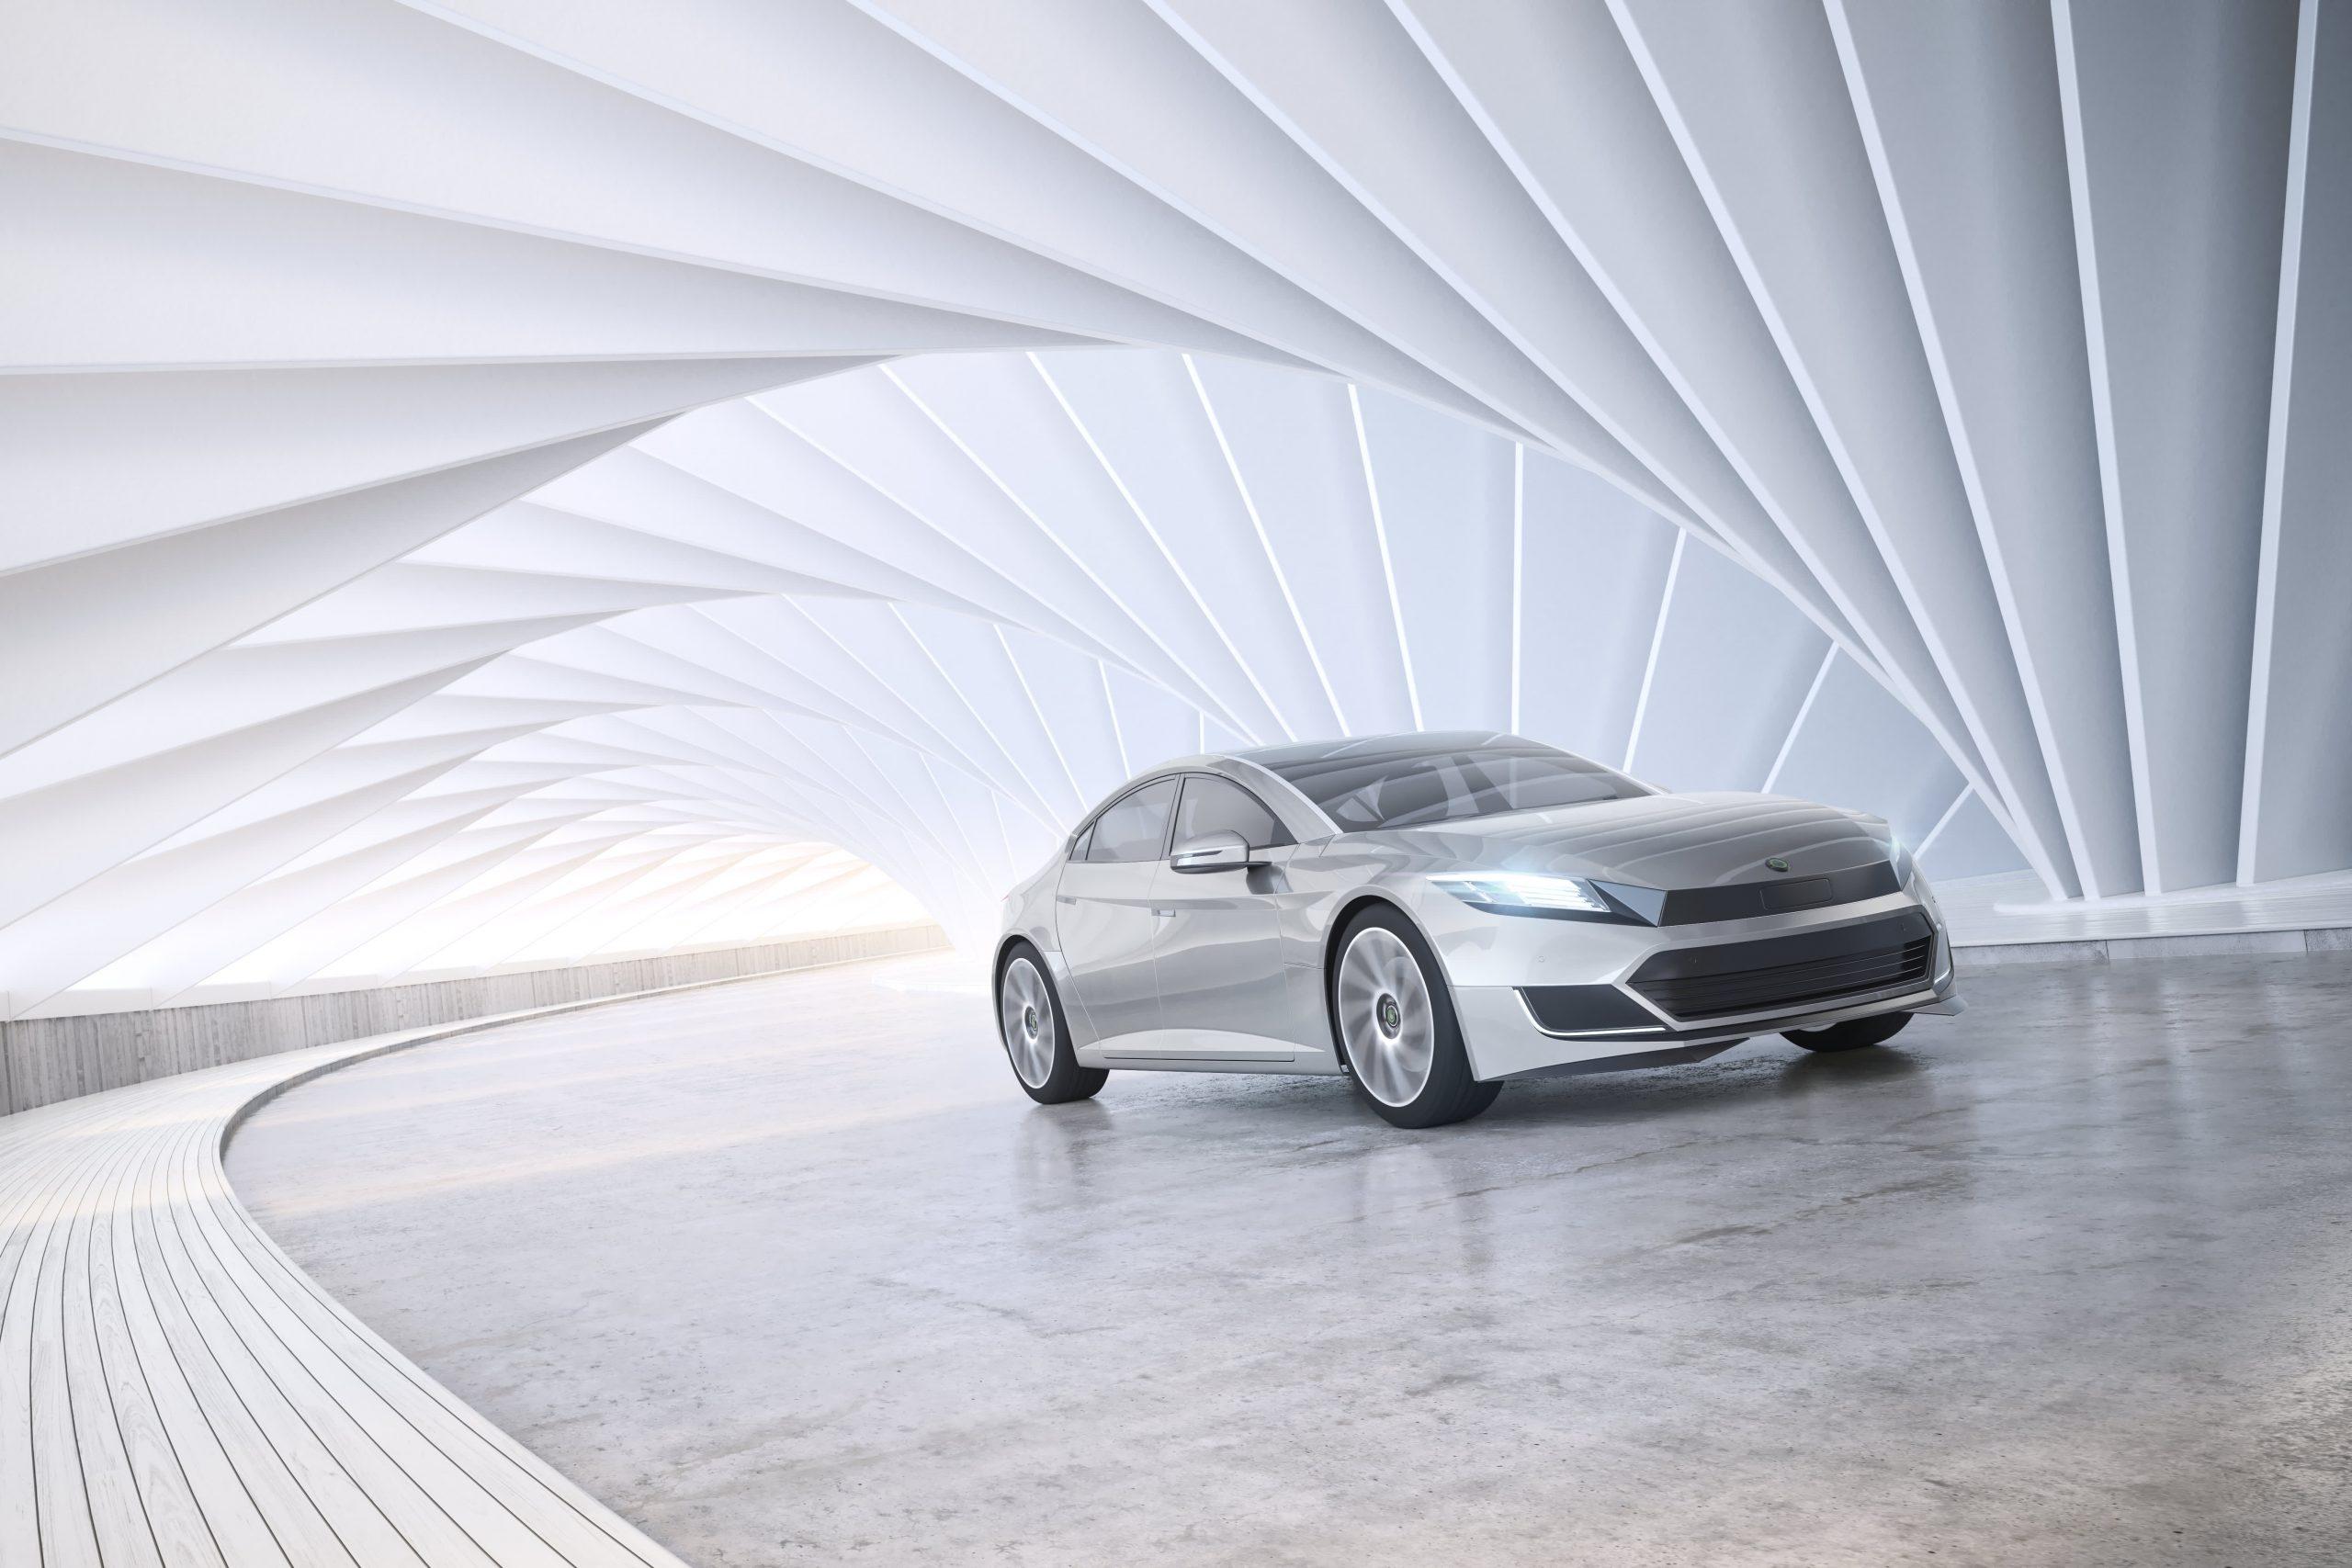 Self driving car stocks to buy in 2021: Goldman Sachs